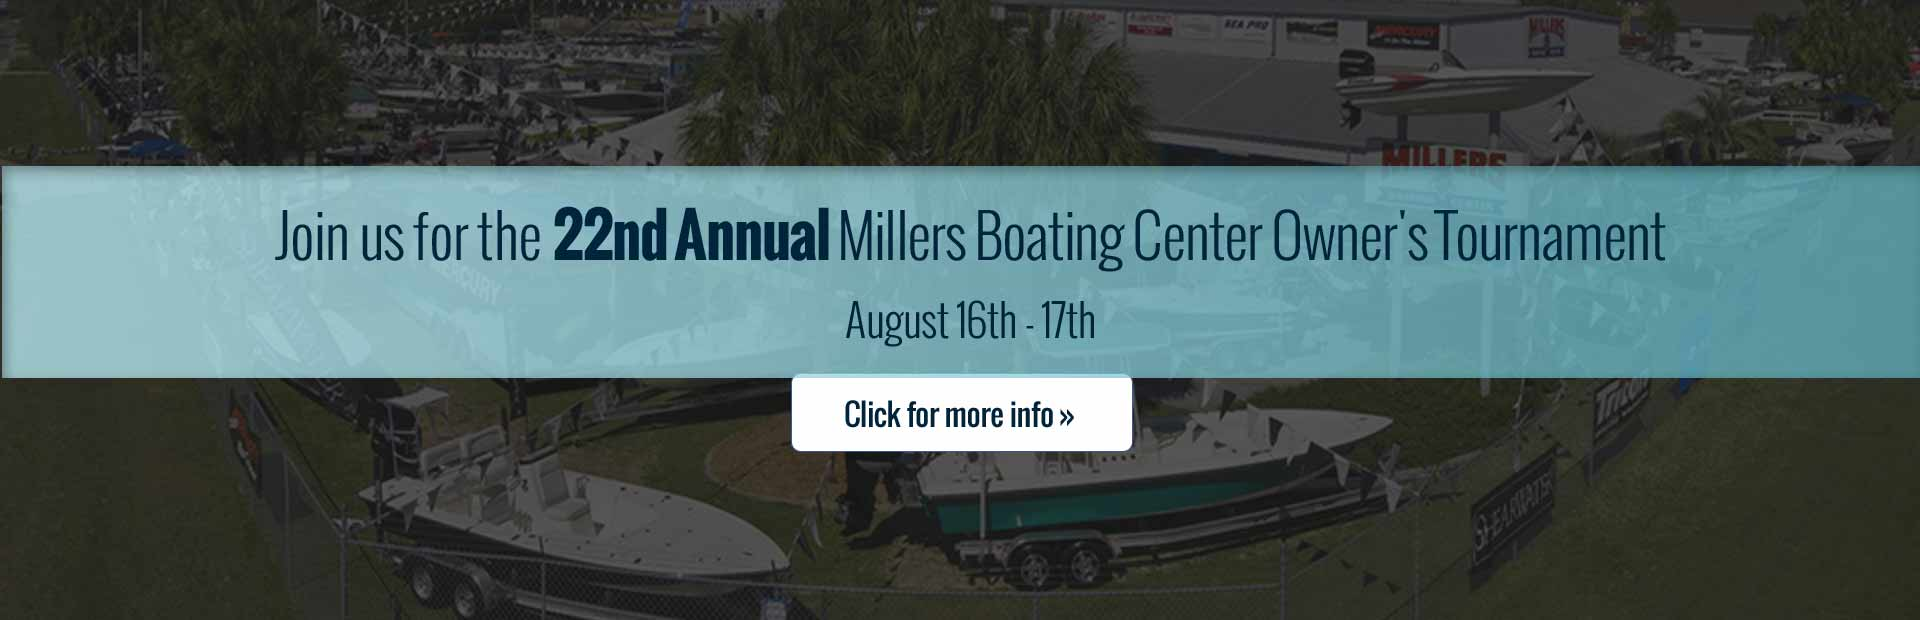 Home Millers Boating Center Ocala, FL (877) 898-1474